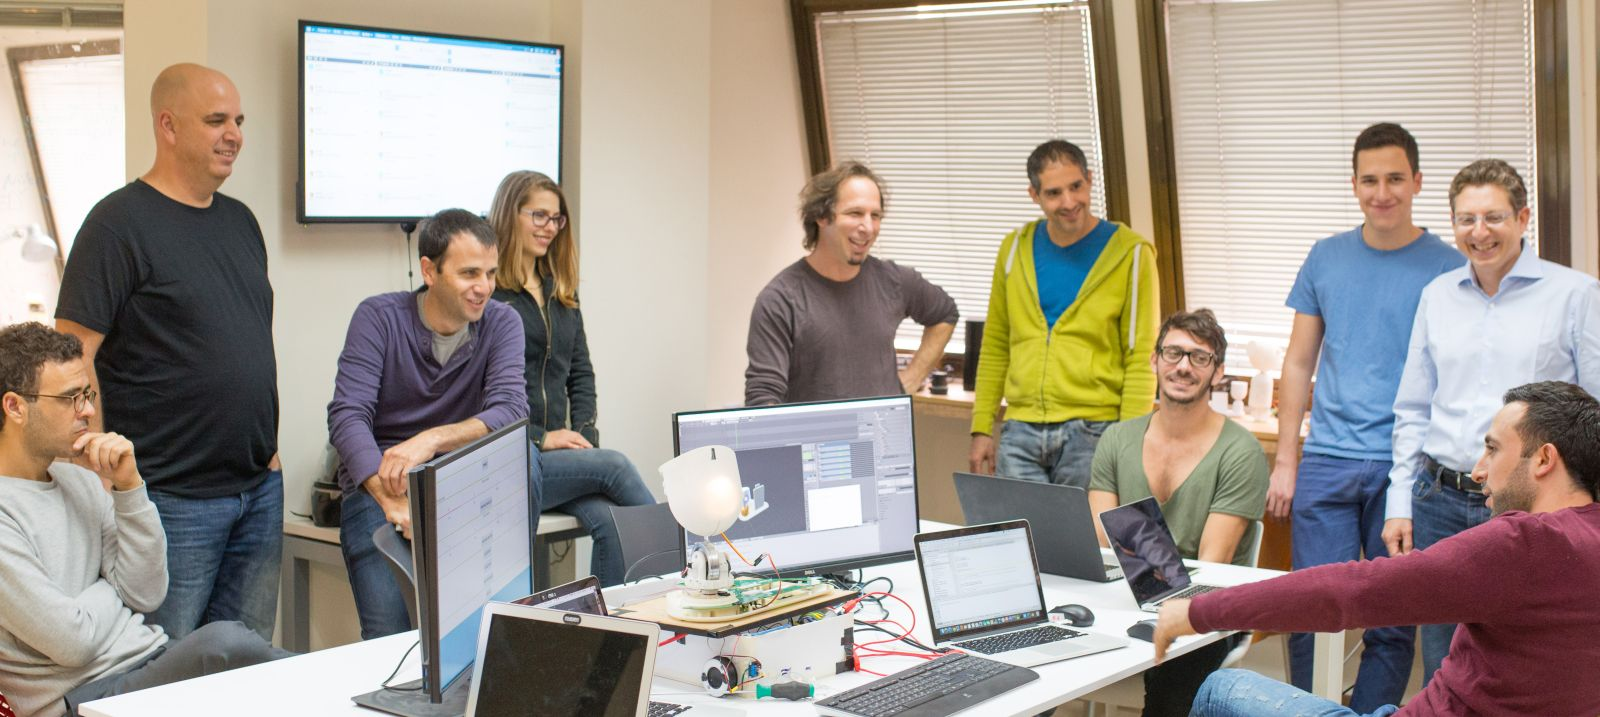 Intuition Robotics team, from left: Shlomi Azoulai, Roy Amir, Itai Mendelsohn, Keren Etkin, Boaz Barkai, David Edery, Itai Perez, Tomer Schlesinger, Dor Skuler, Islam Heralla. Photo: courtesy